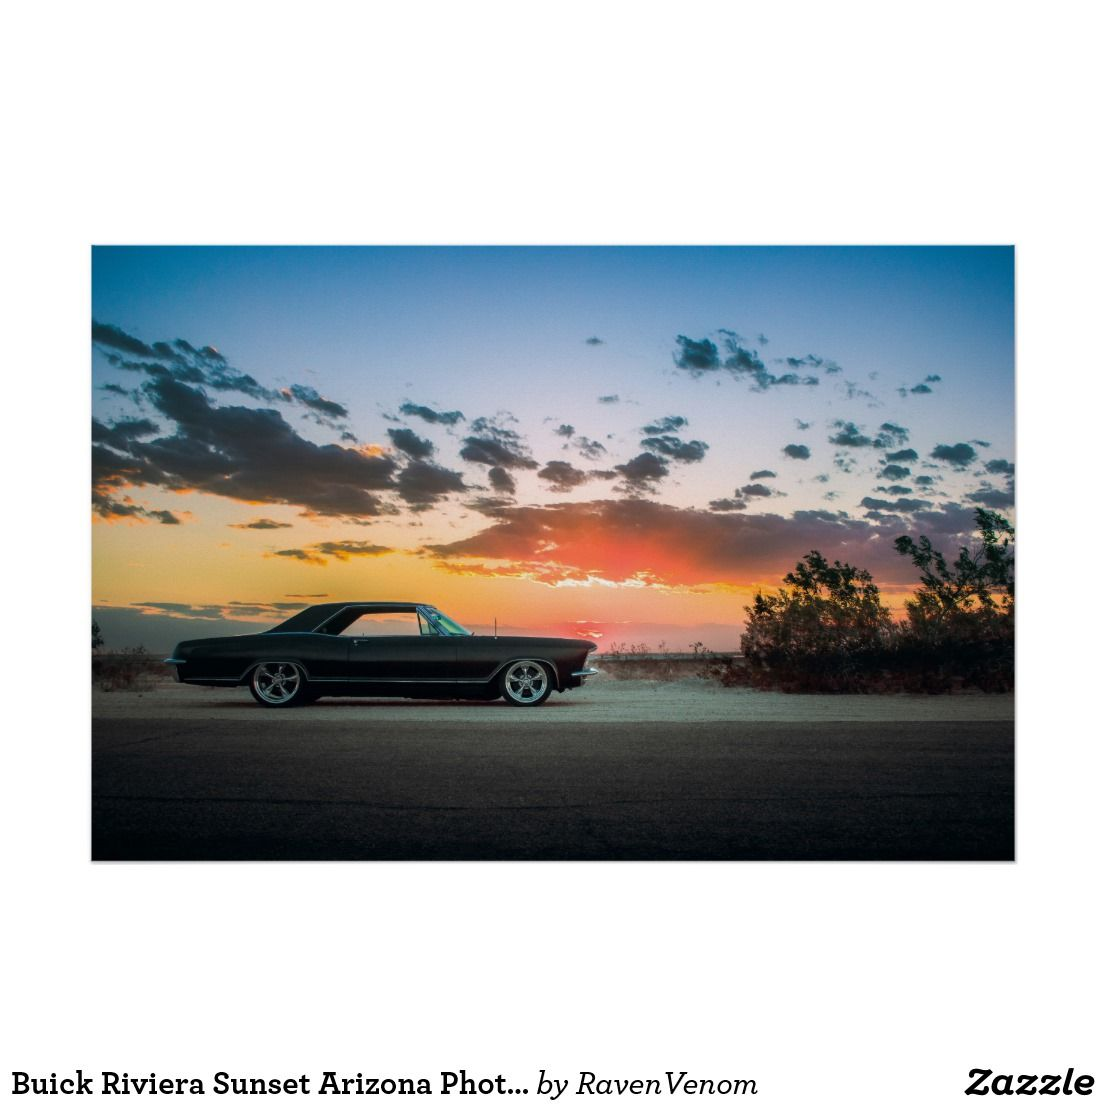 Buick Riviera Sunset Arizona Photo Poster Zazzle Com In 2020